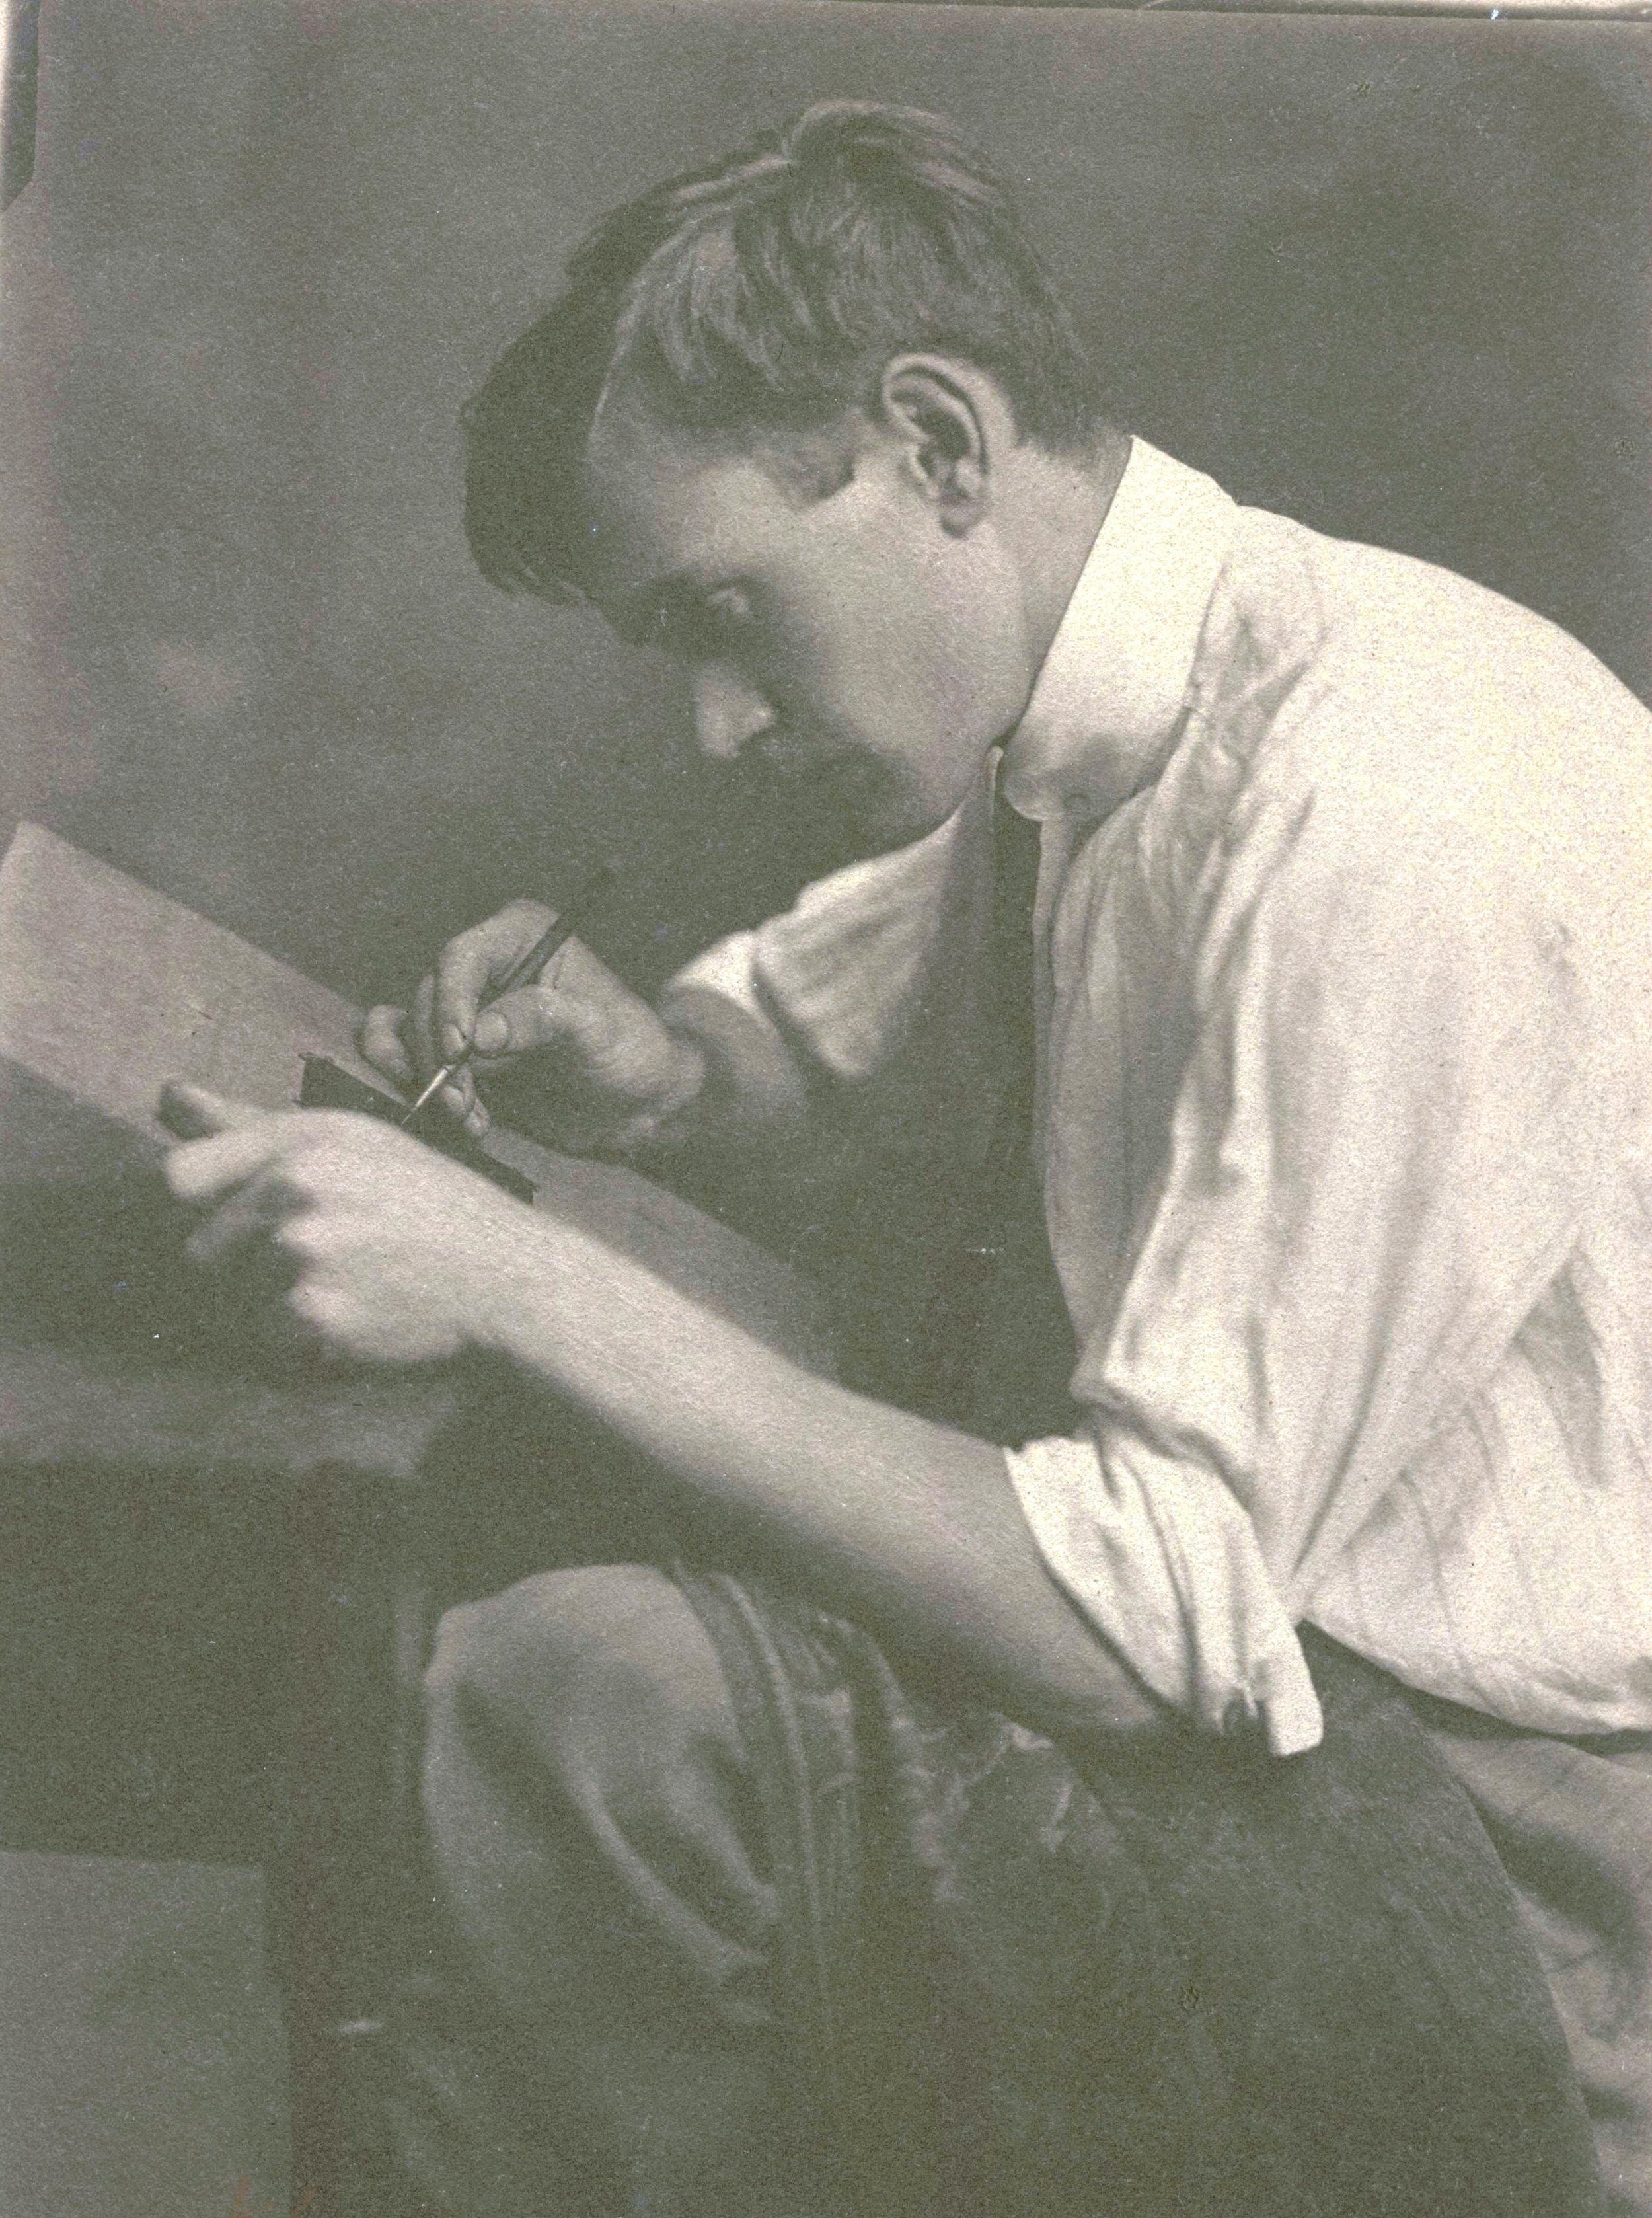 A young Carl Schmitt in the studio